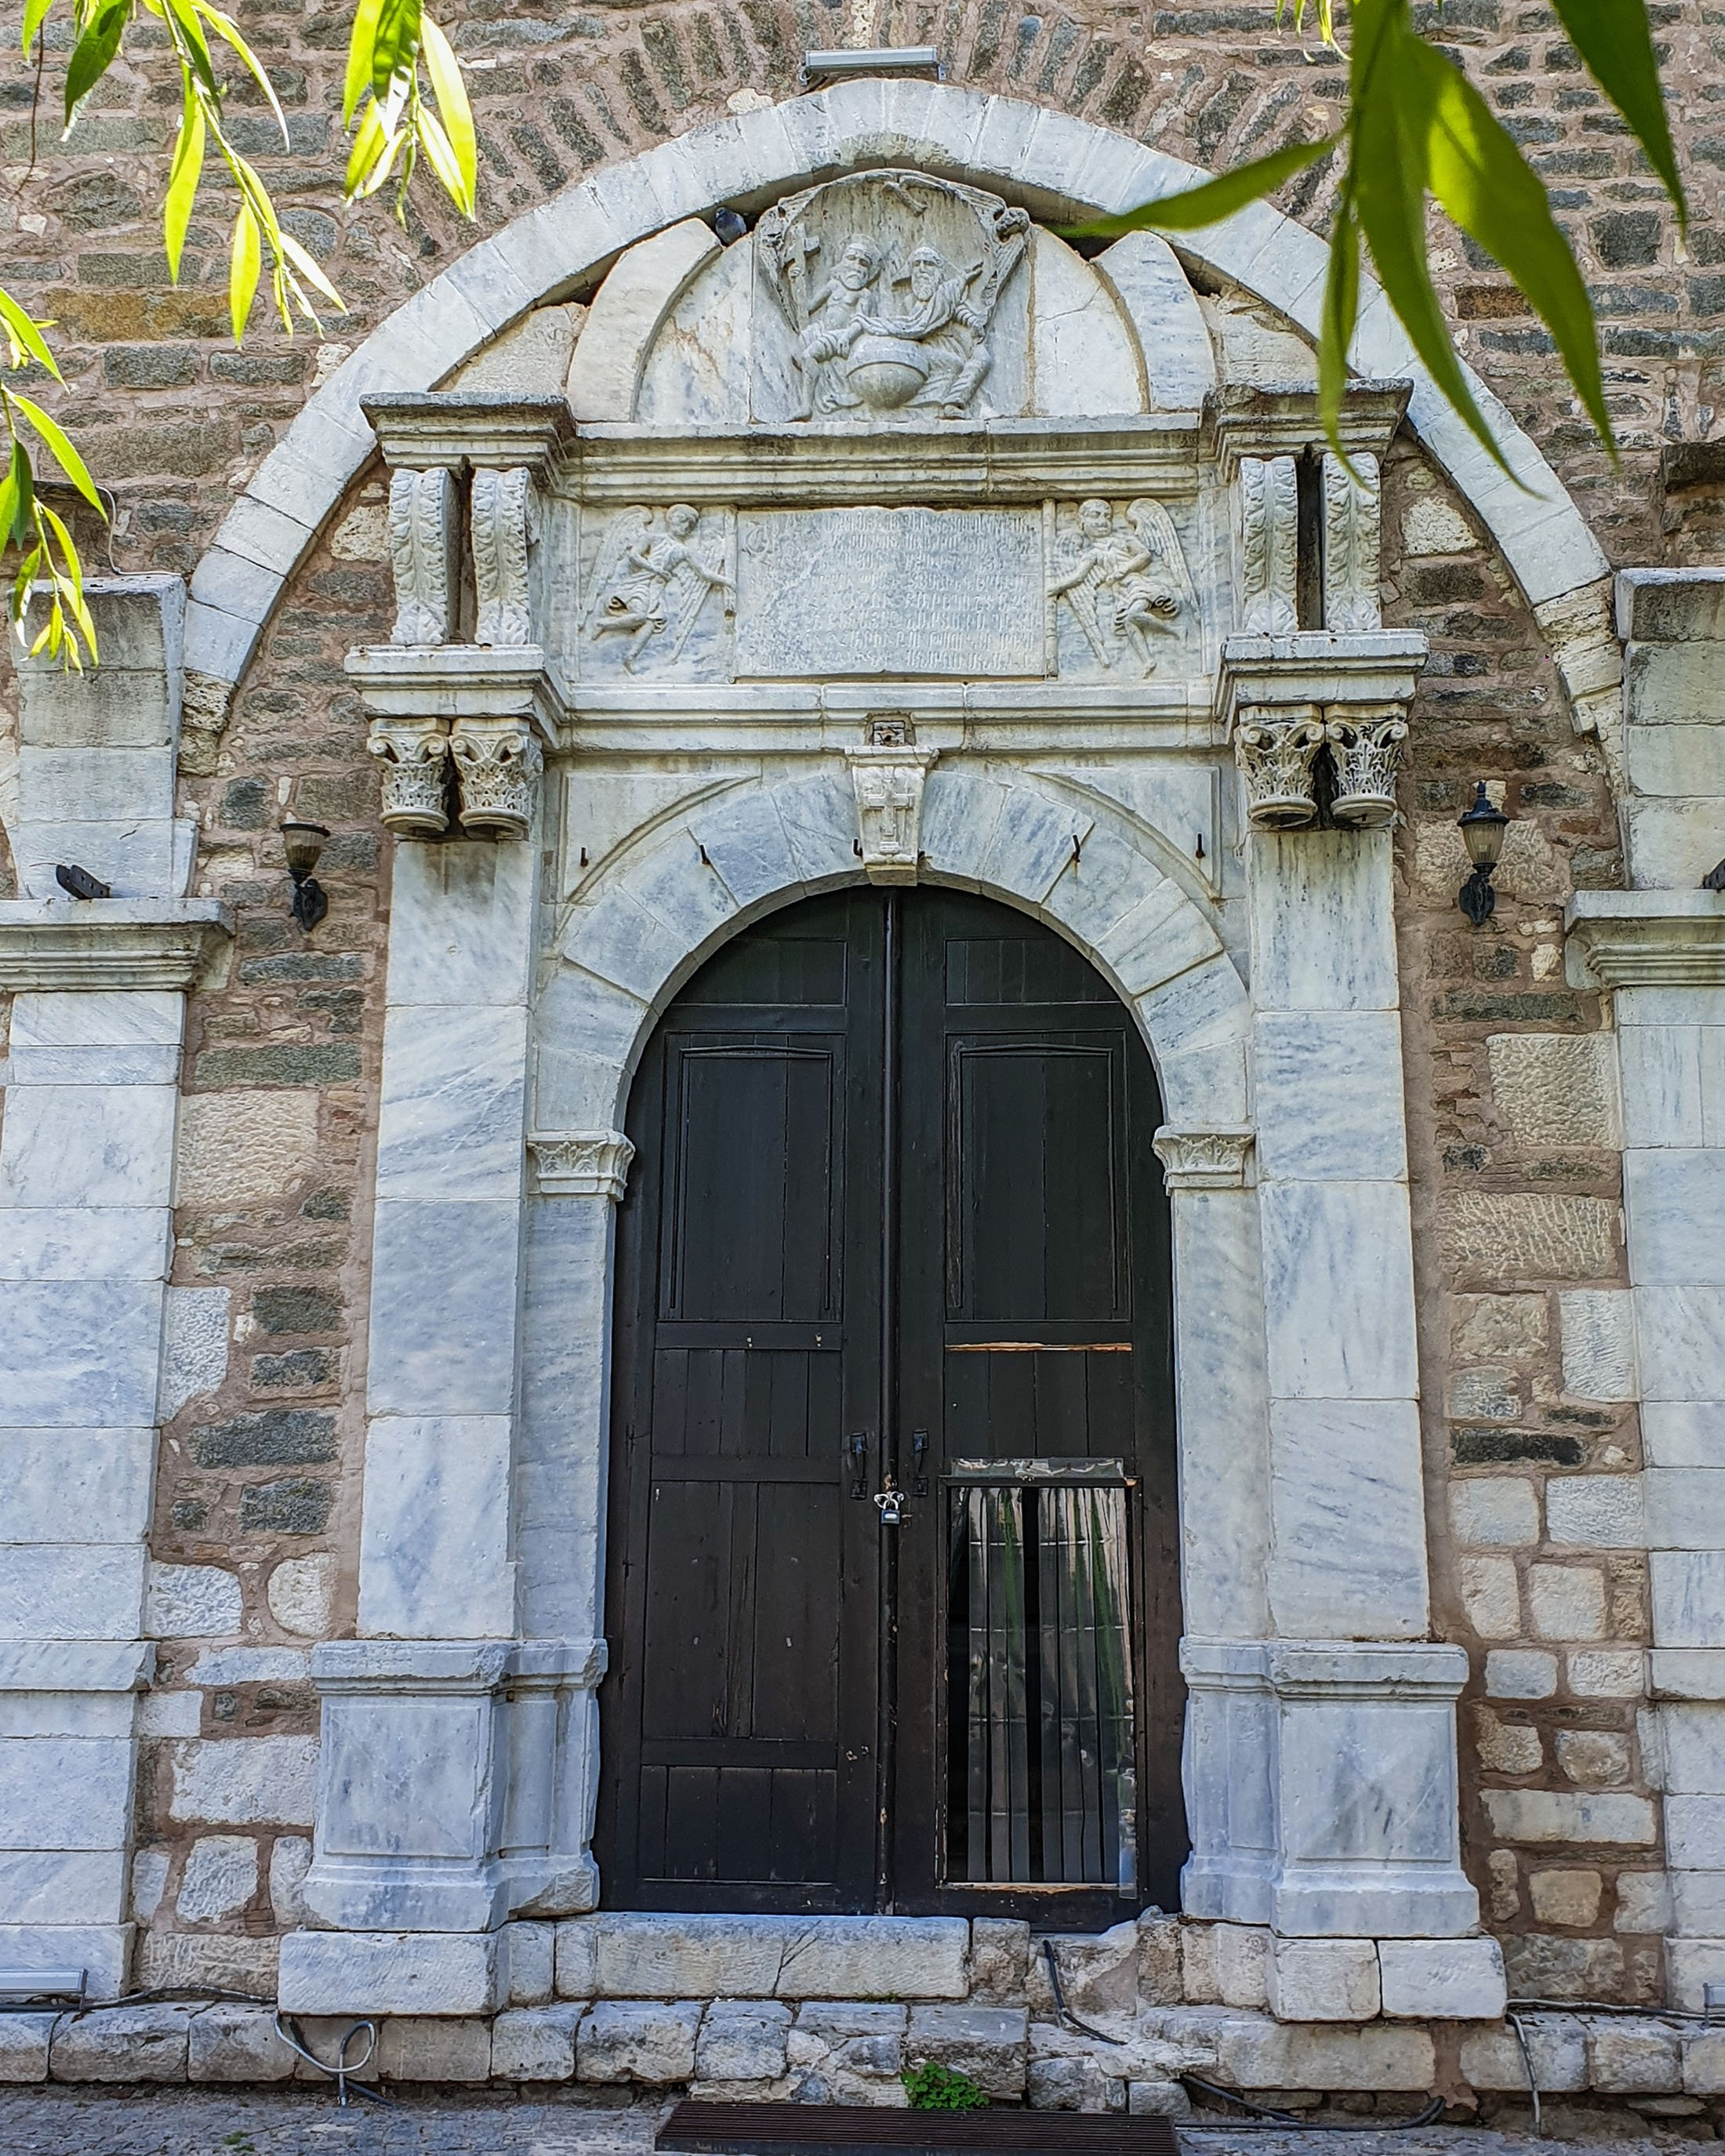 The impressive entrance to the Sivrihisar Armenian Church, Sivrihisar, Eskişehir, central Turkey. (Photo by Argun Konuk)